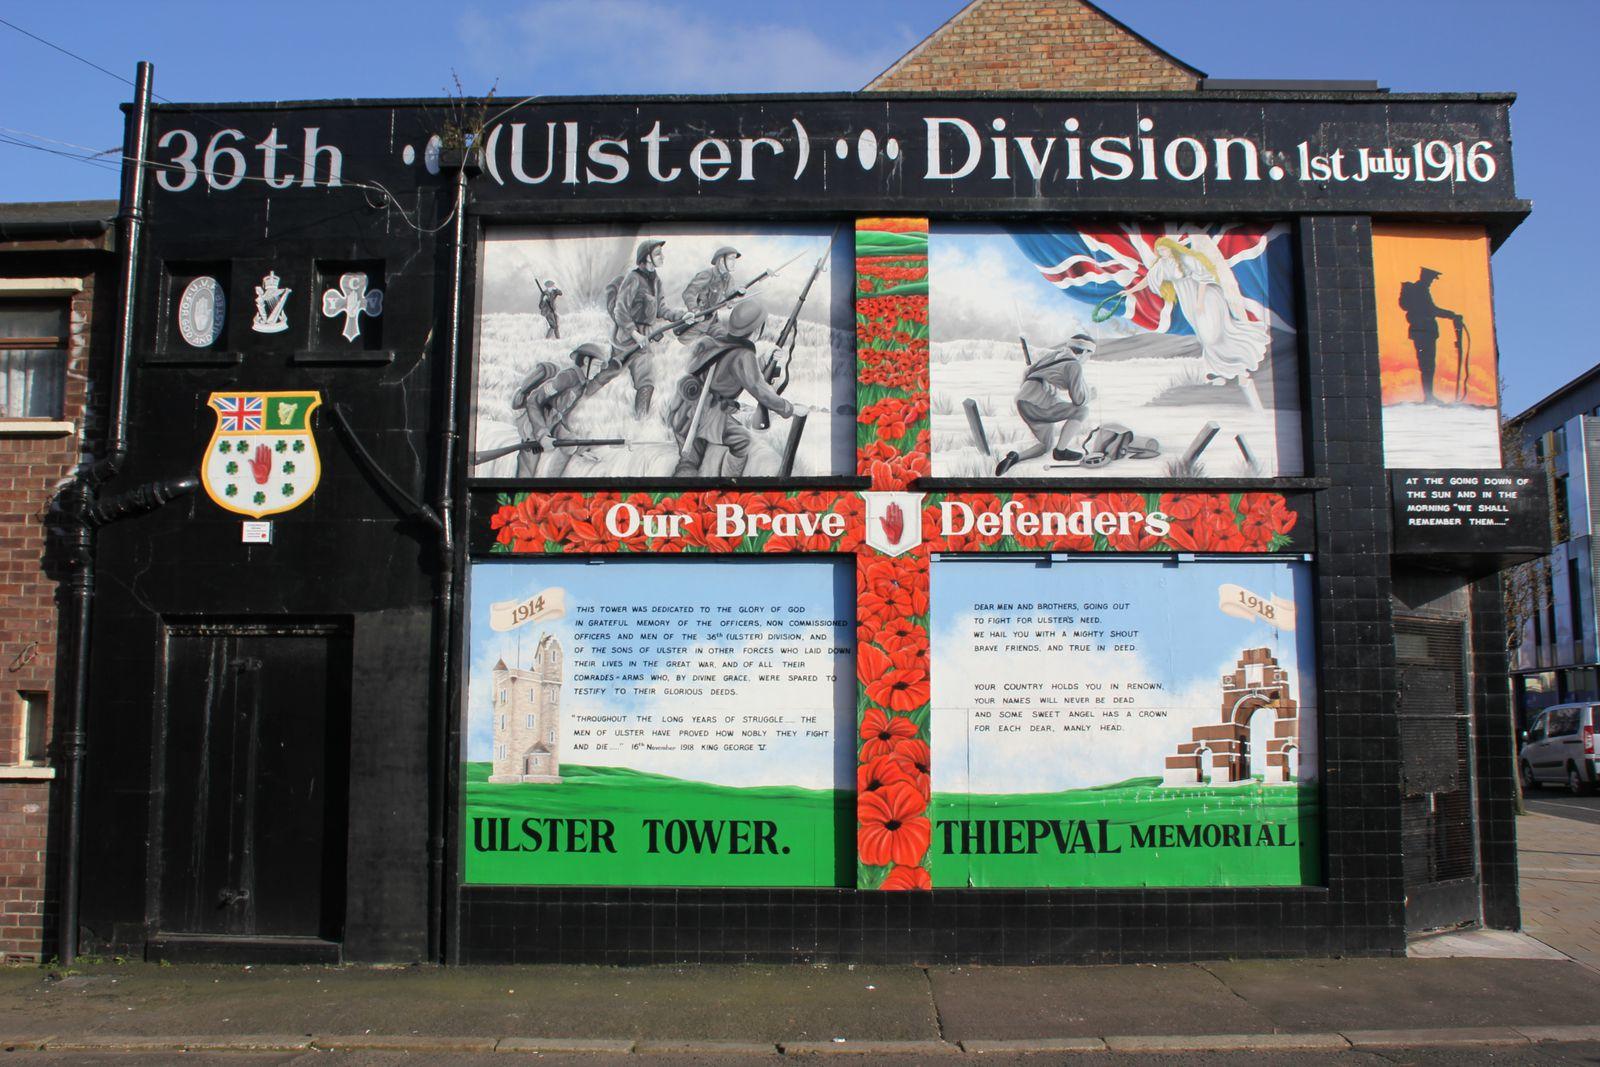 438) Newtownards Road, East Belfast